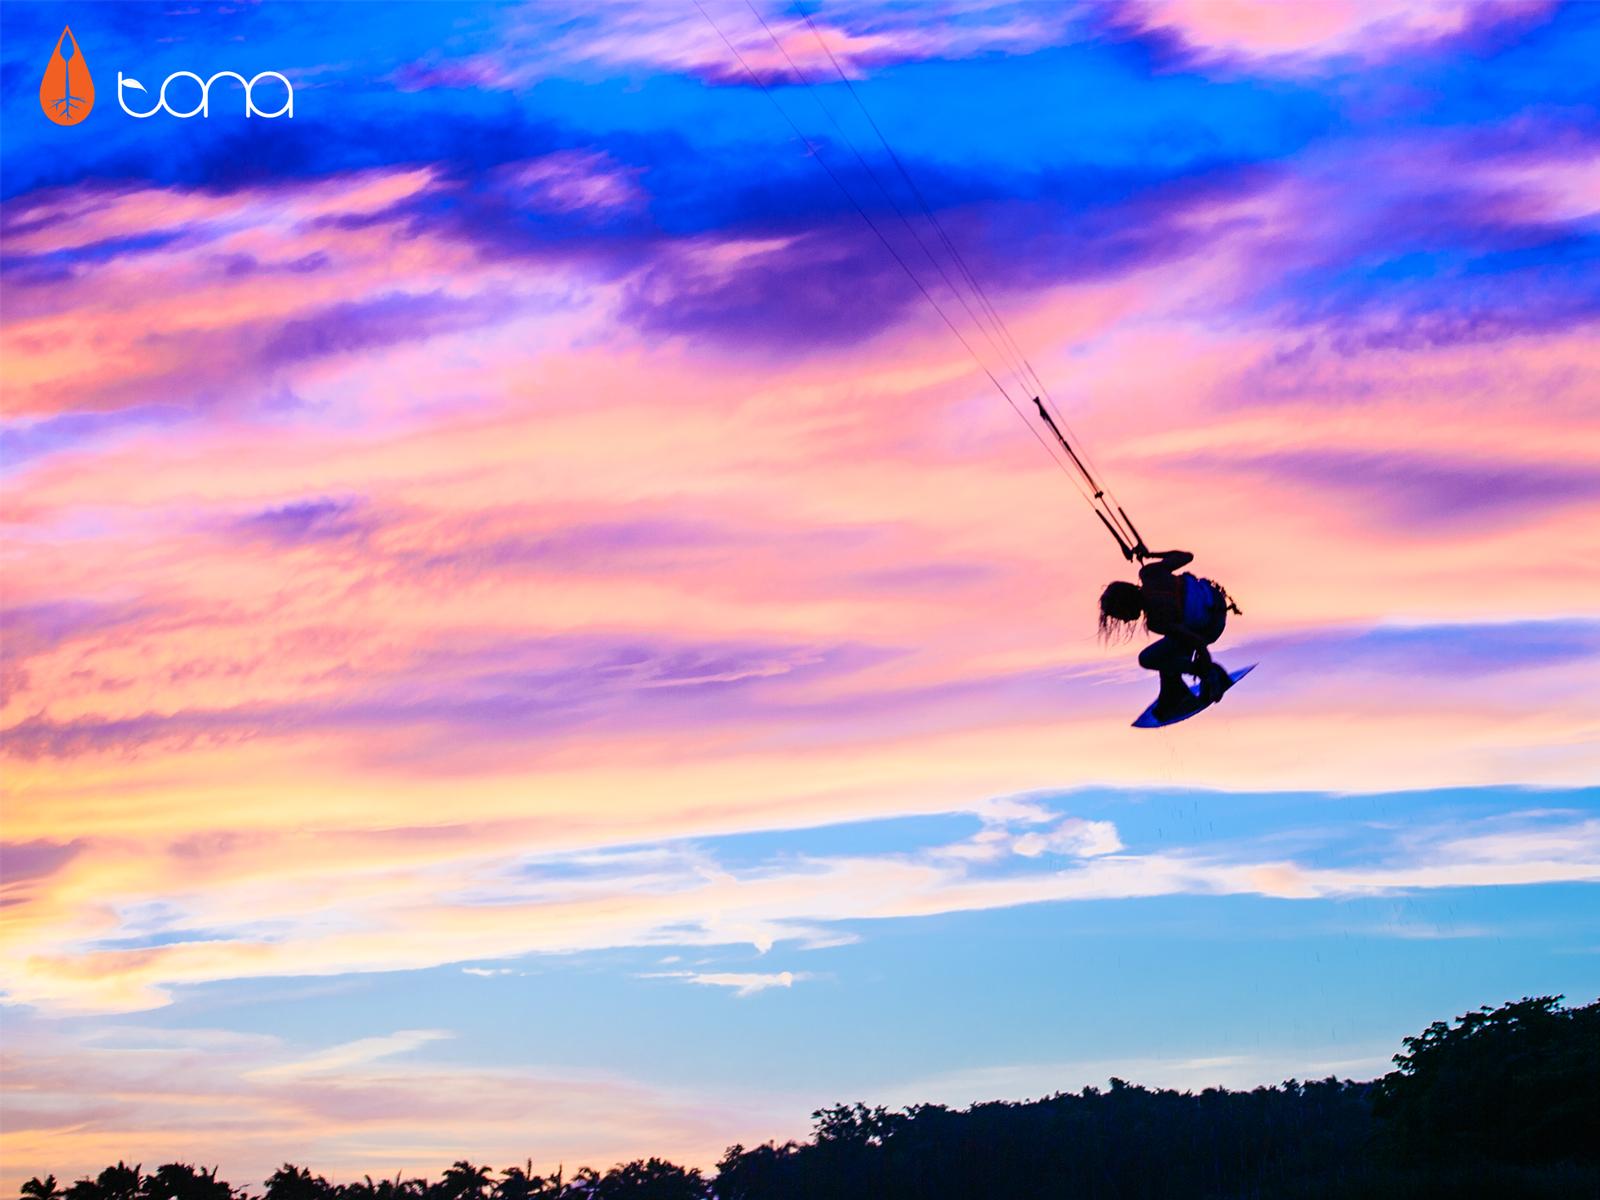 kitesurf wallpaper image - Indie grab at sunset with Tona Boards - kitesurfing - in resolution: Standard 4:3 1600 X 1200